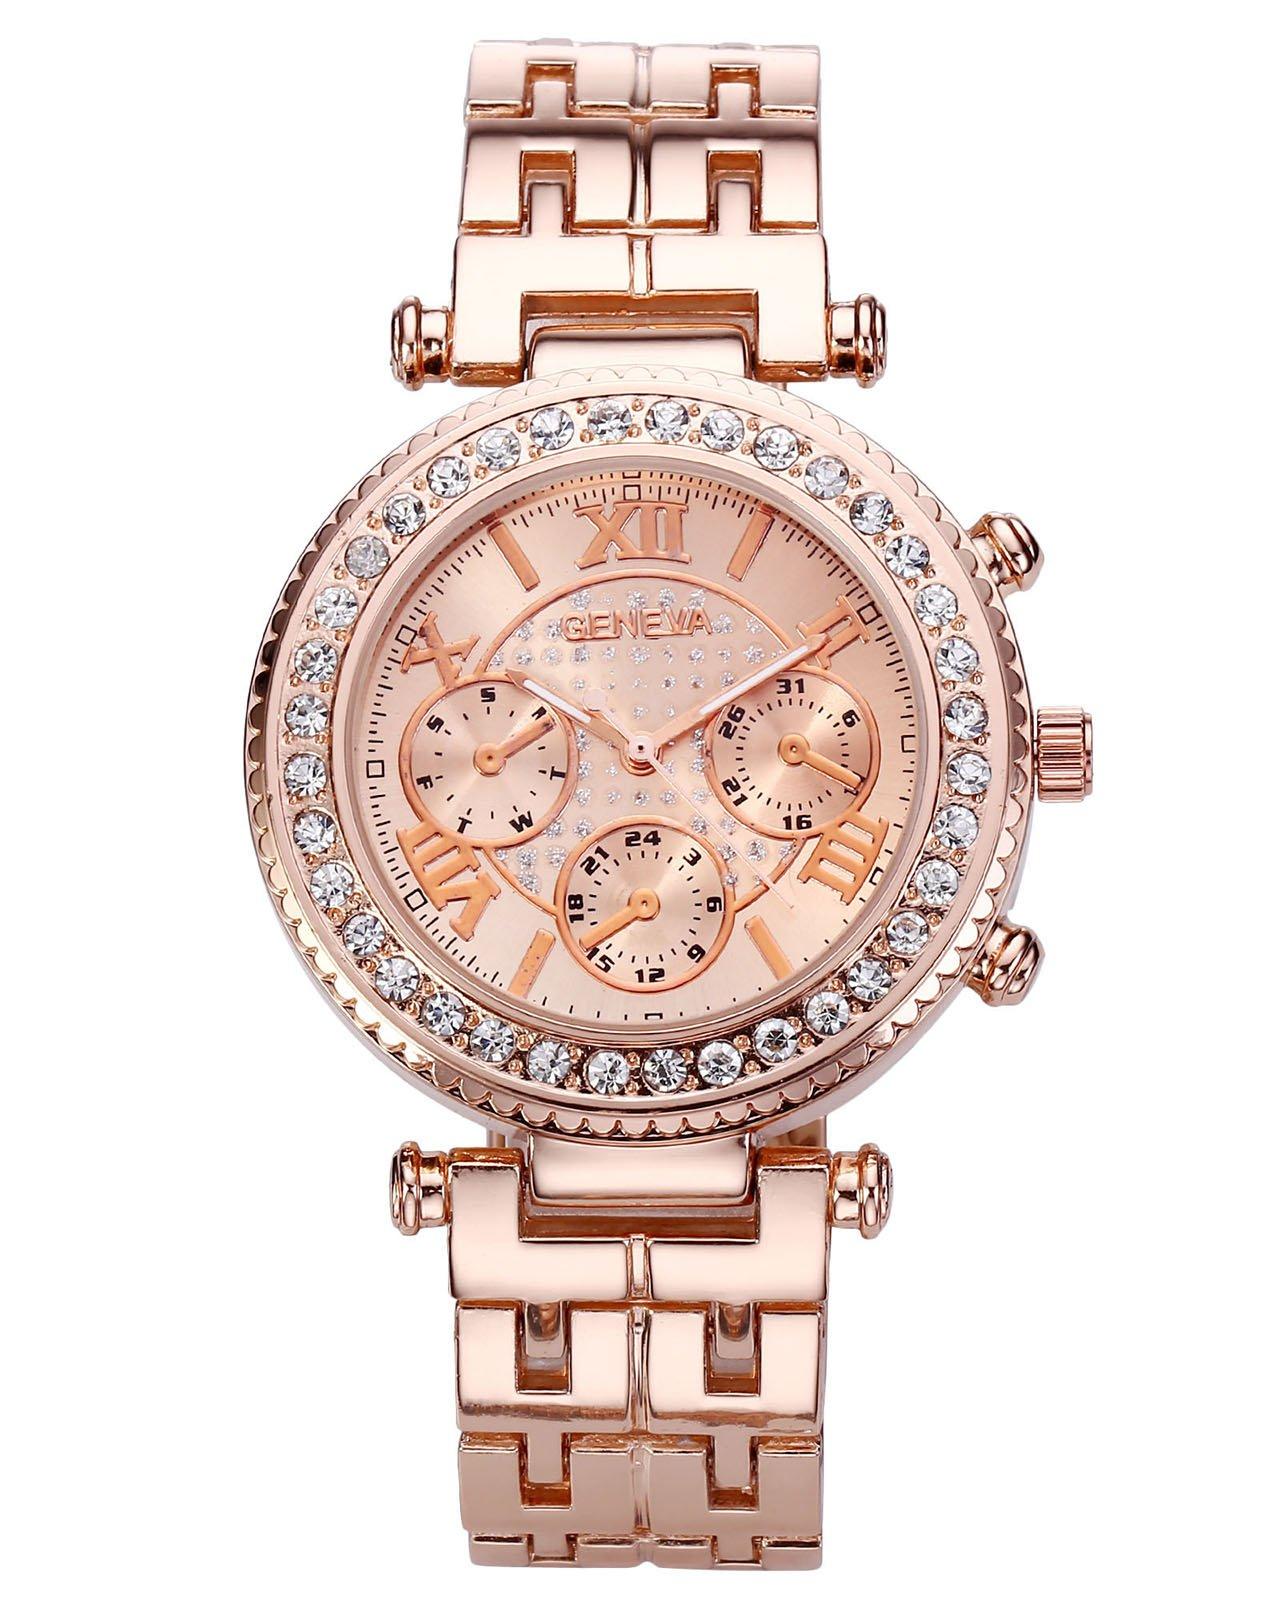 JSDDE Uhren,Klassische Genf Damen Uhren Strass Armbanduhr Traveler unecht Chronograph Damenuhr Blogger Business Quarzuhr (Rosegold)